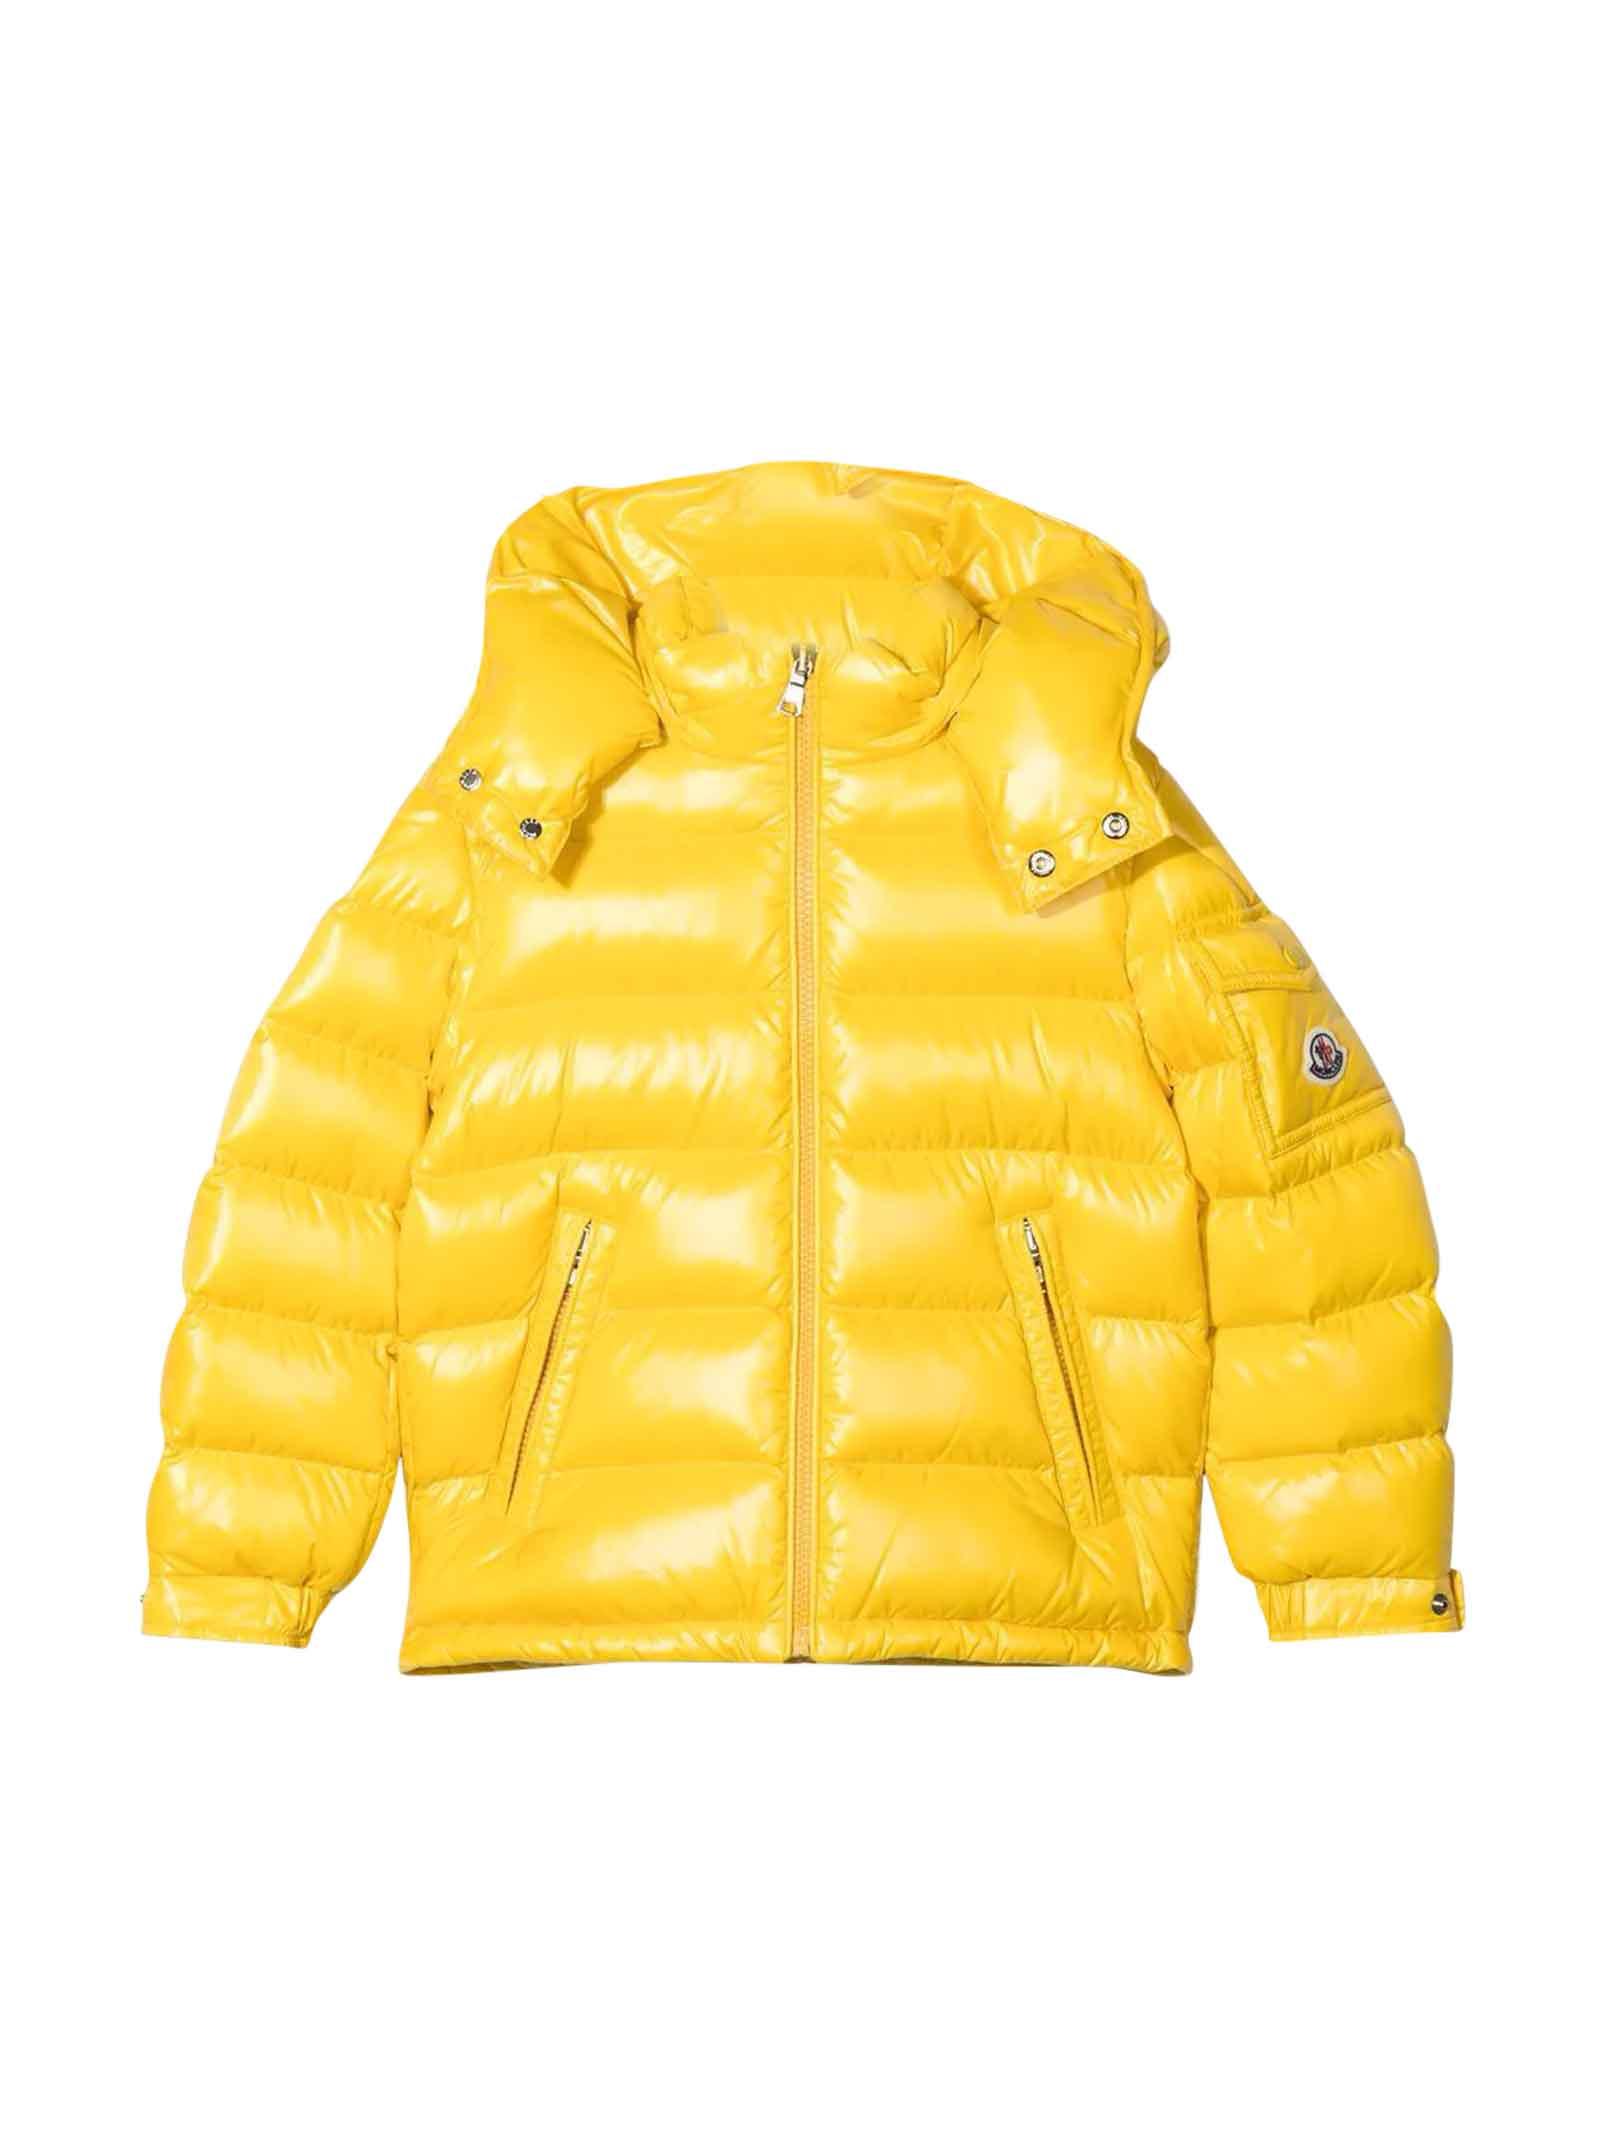 Moncler Moncler Enfant Unisex Yellow Down Jacket